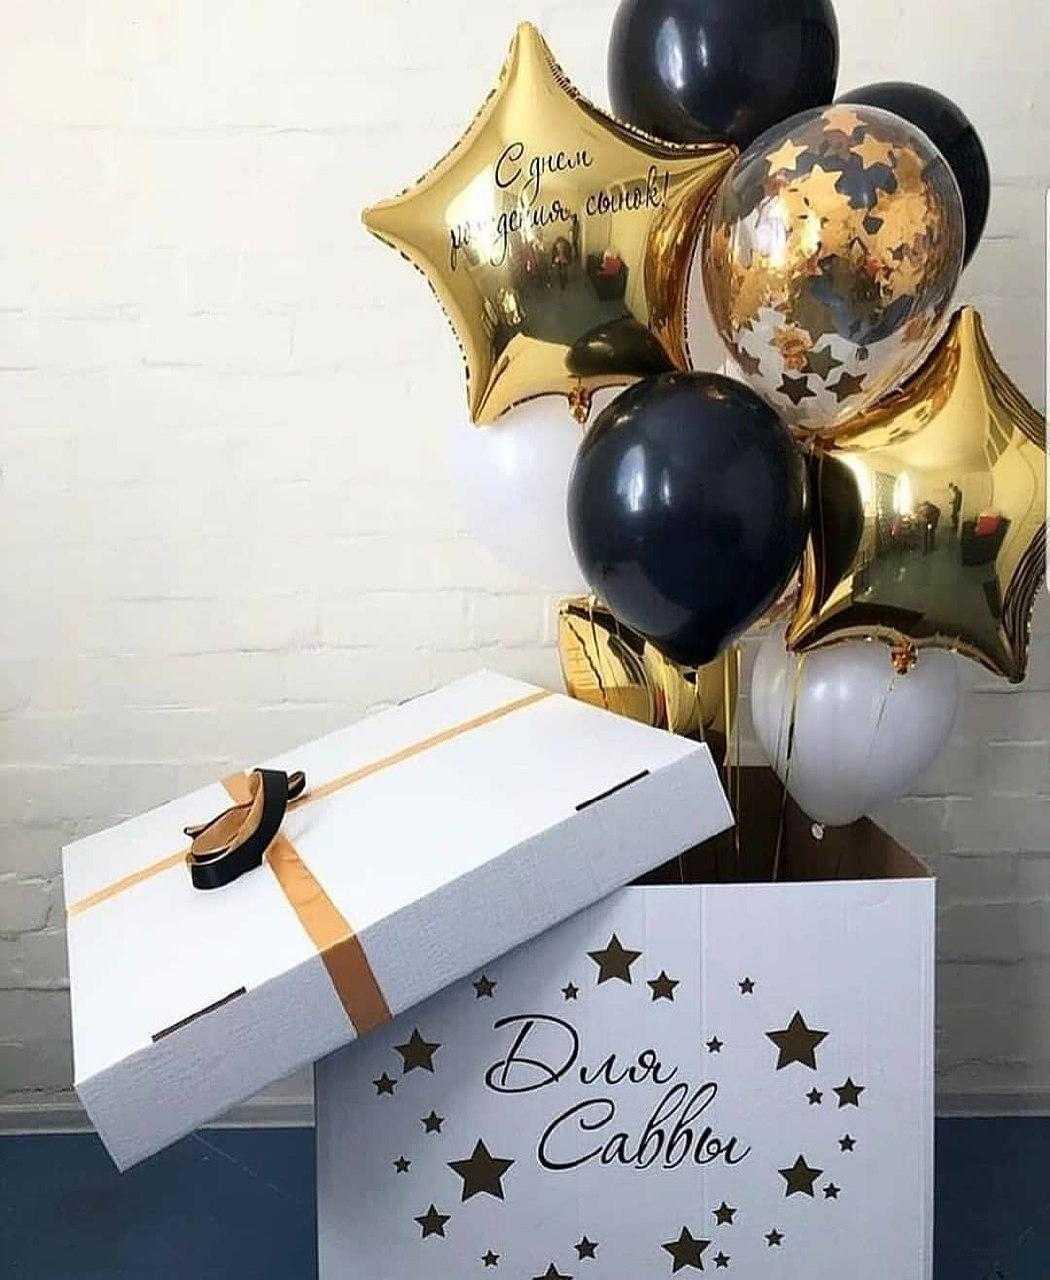 Шары в коробке Коробка сюрприз с шарами на ДР 3600.jpg